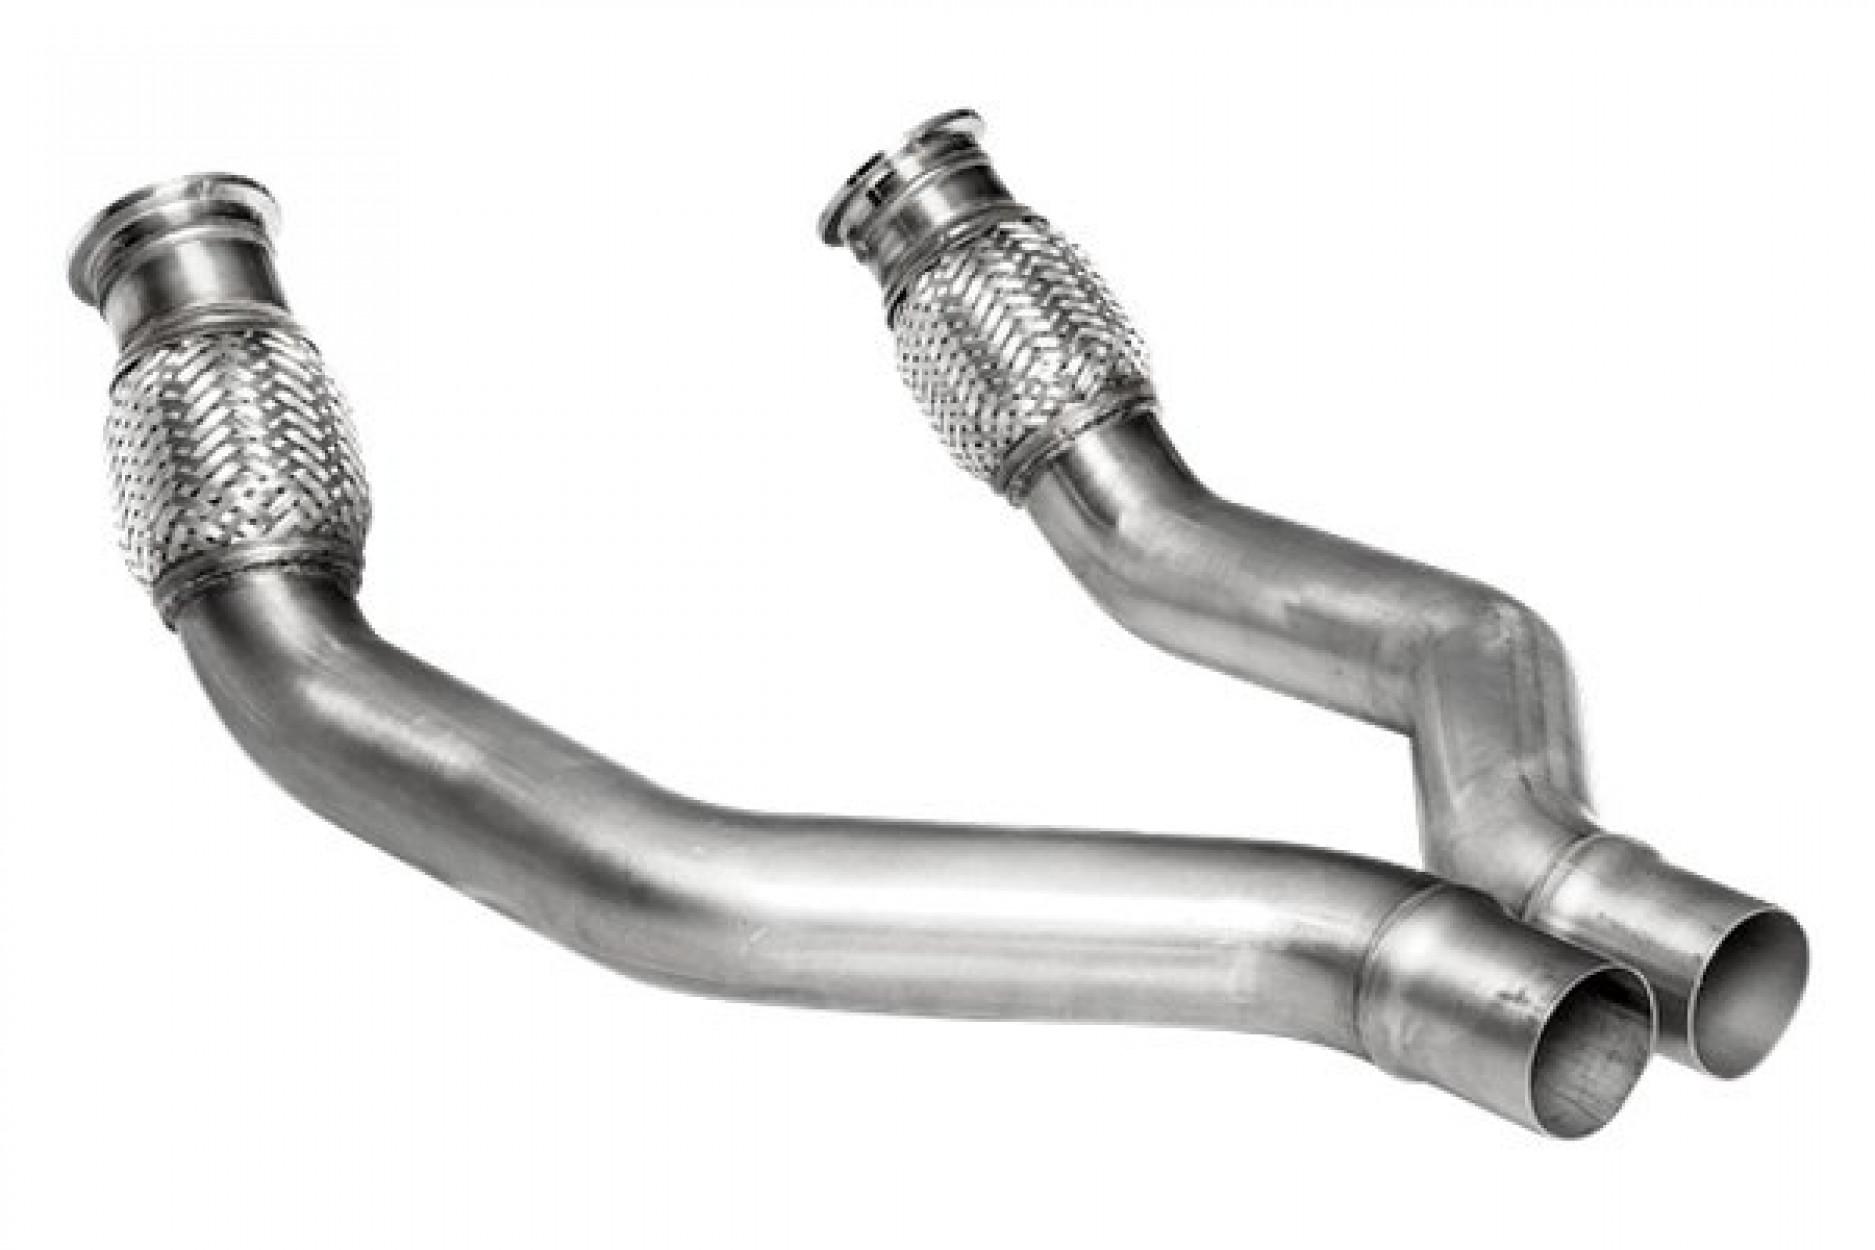 Akrapovic Link pipe set (SS) - für Audi Sport Akrapovic system Kat Ersatzrohr